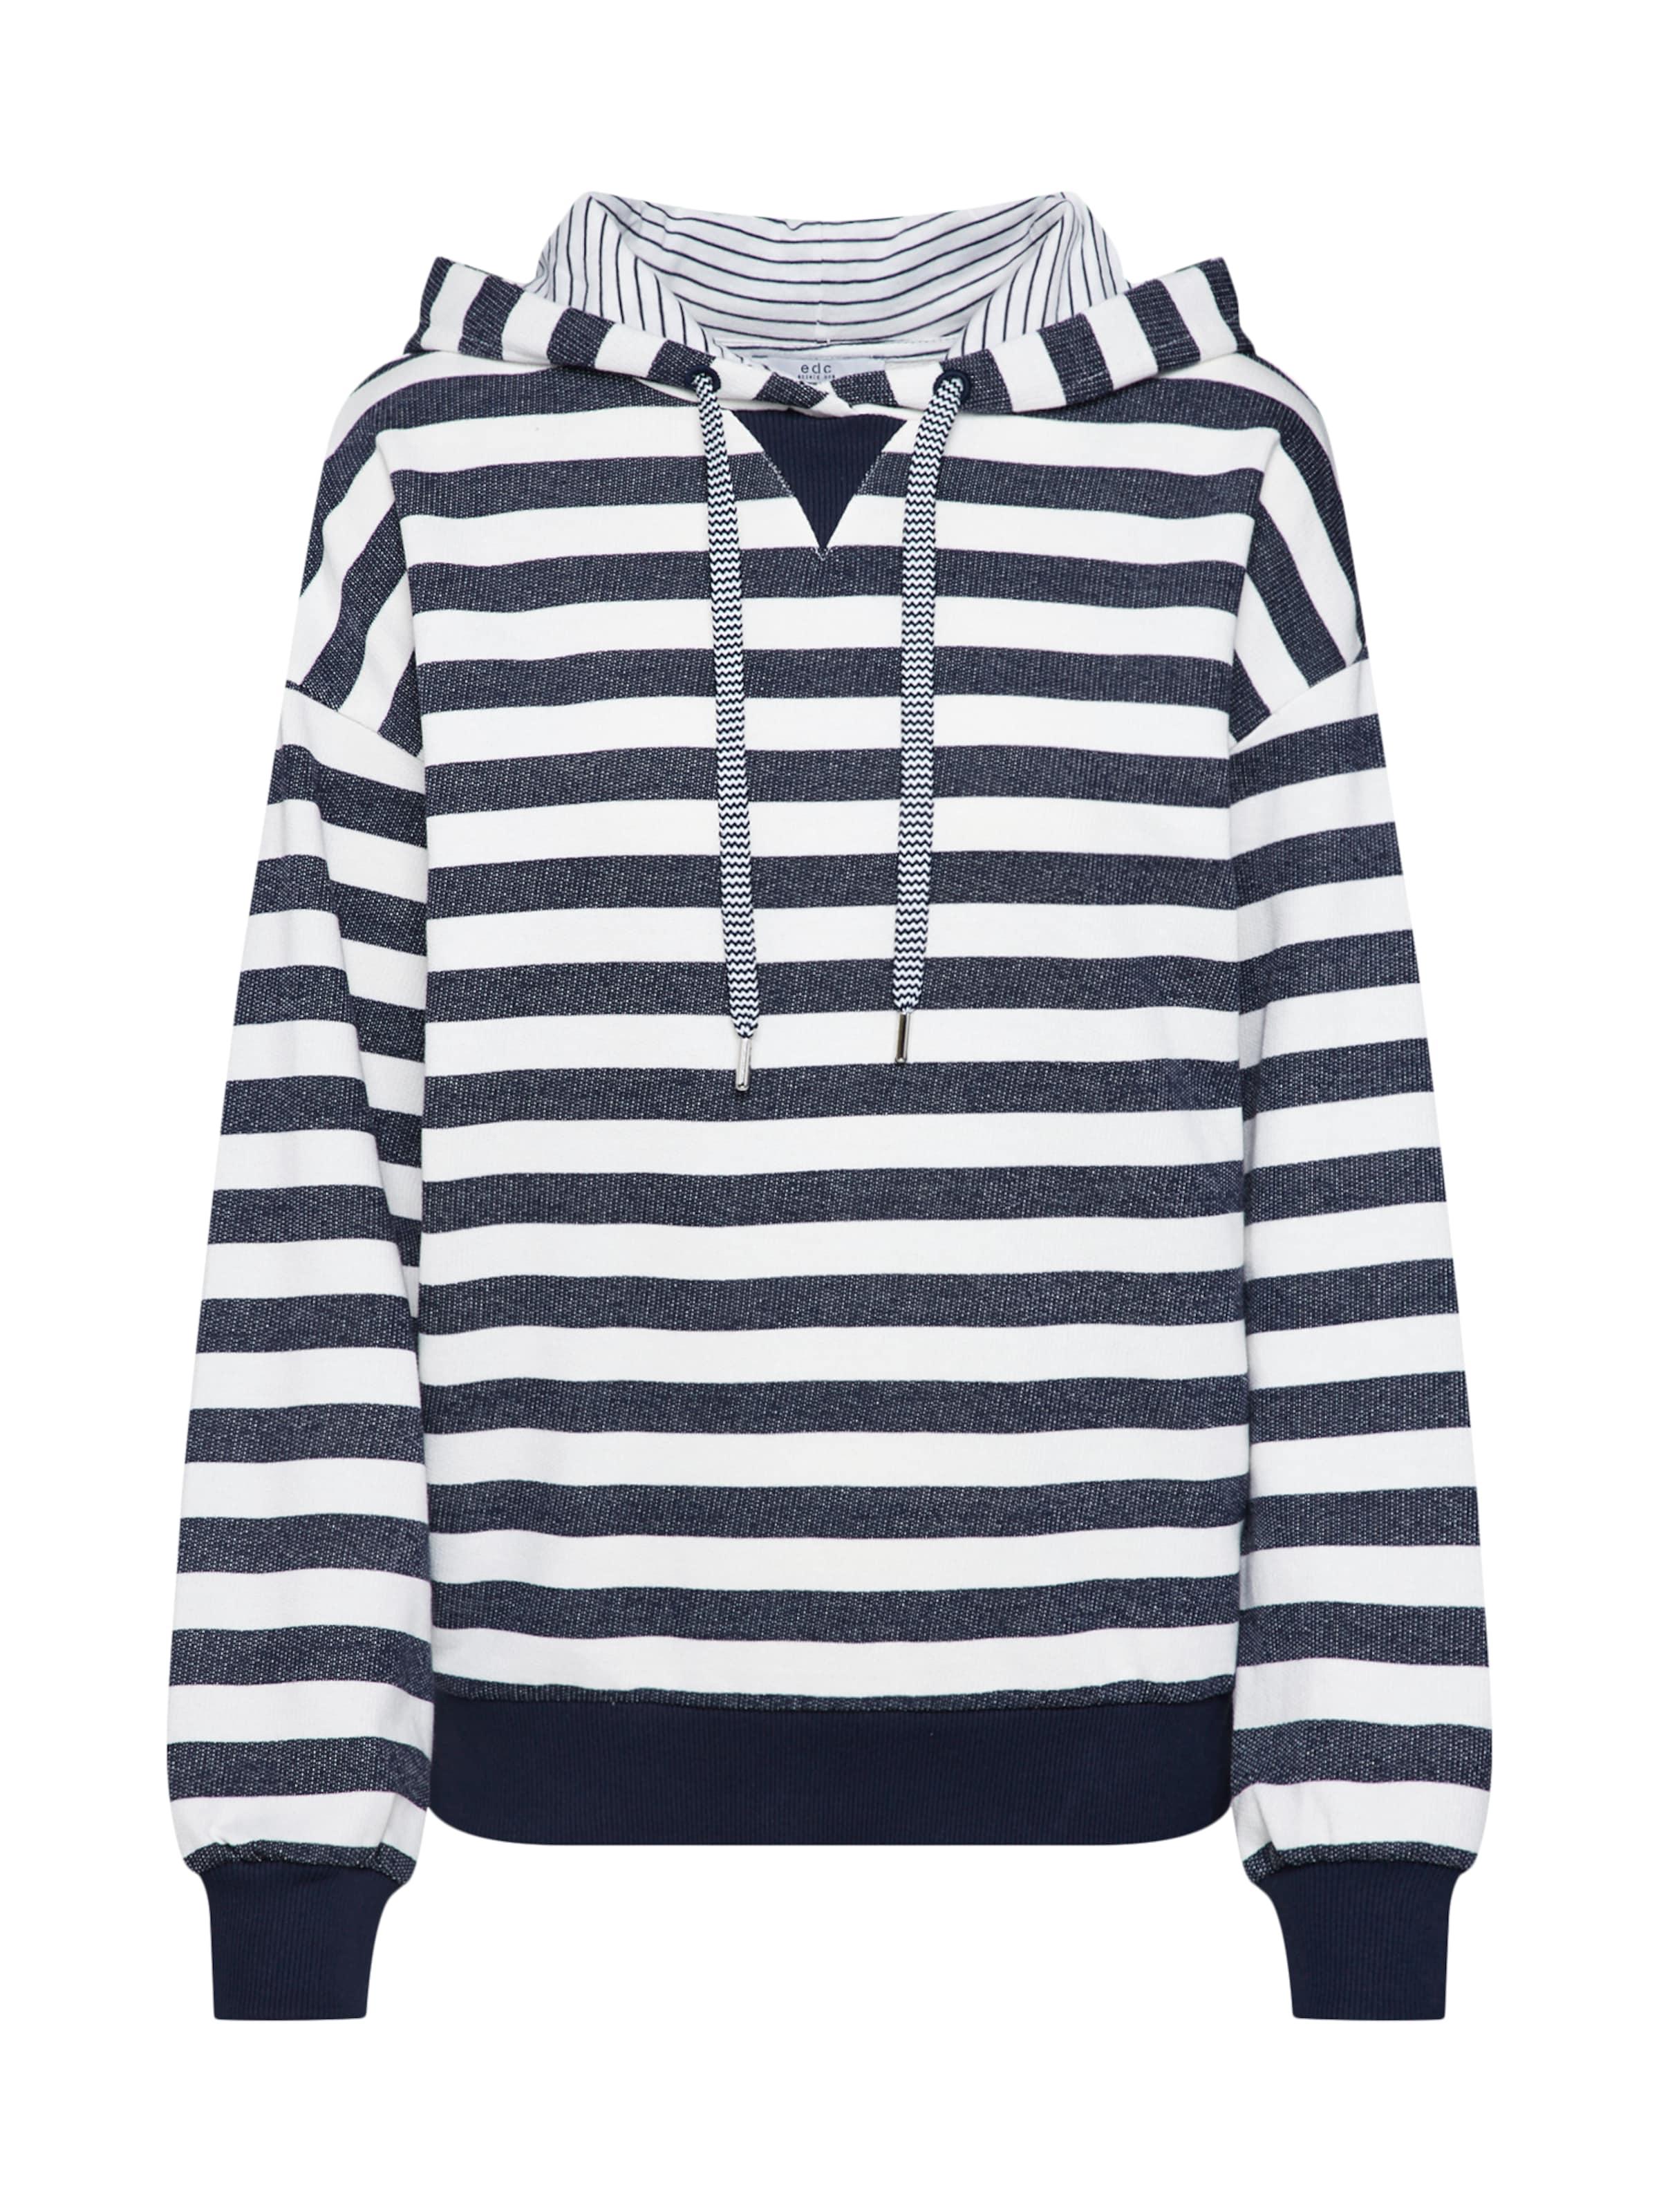 shirt Esprit En CrèmeBleu Edc Sweat Marine By FKc3l1TJ